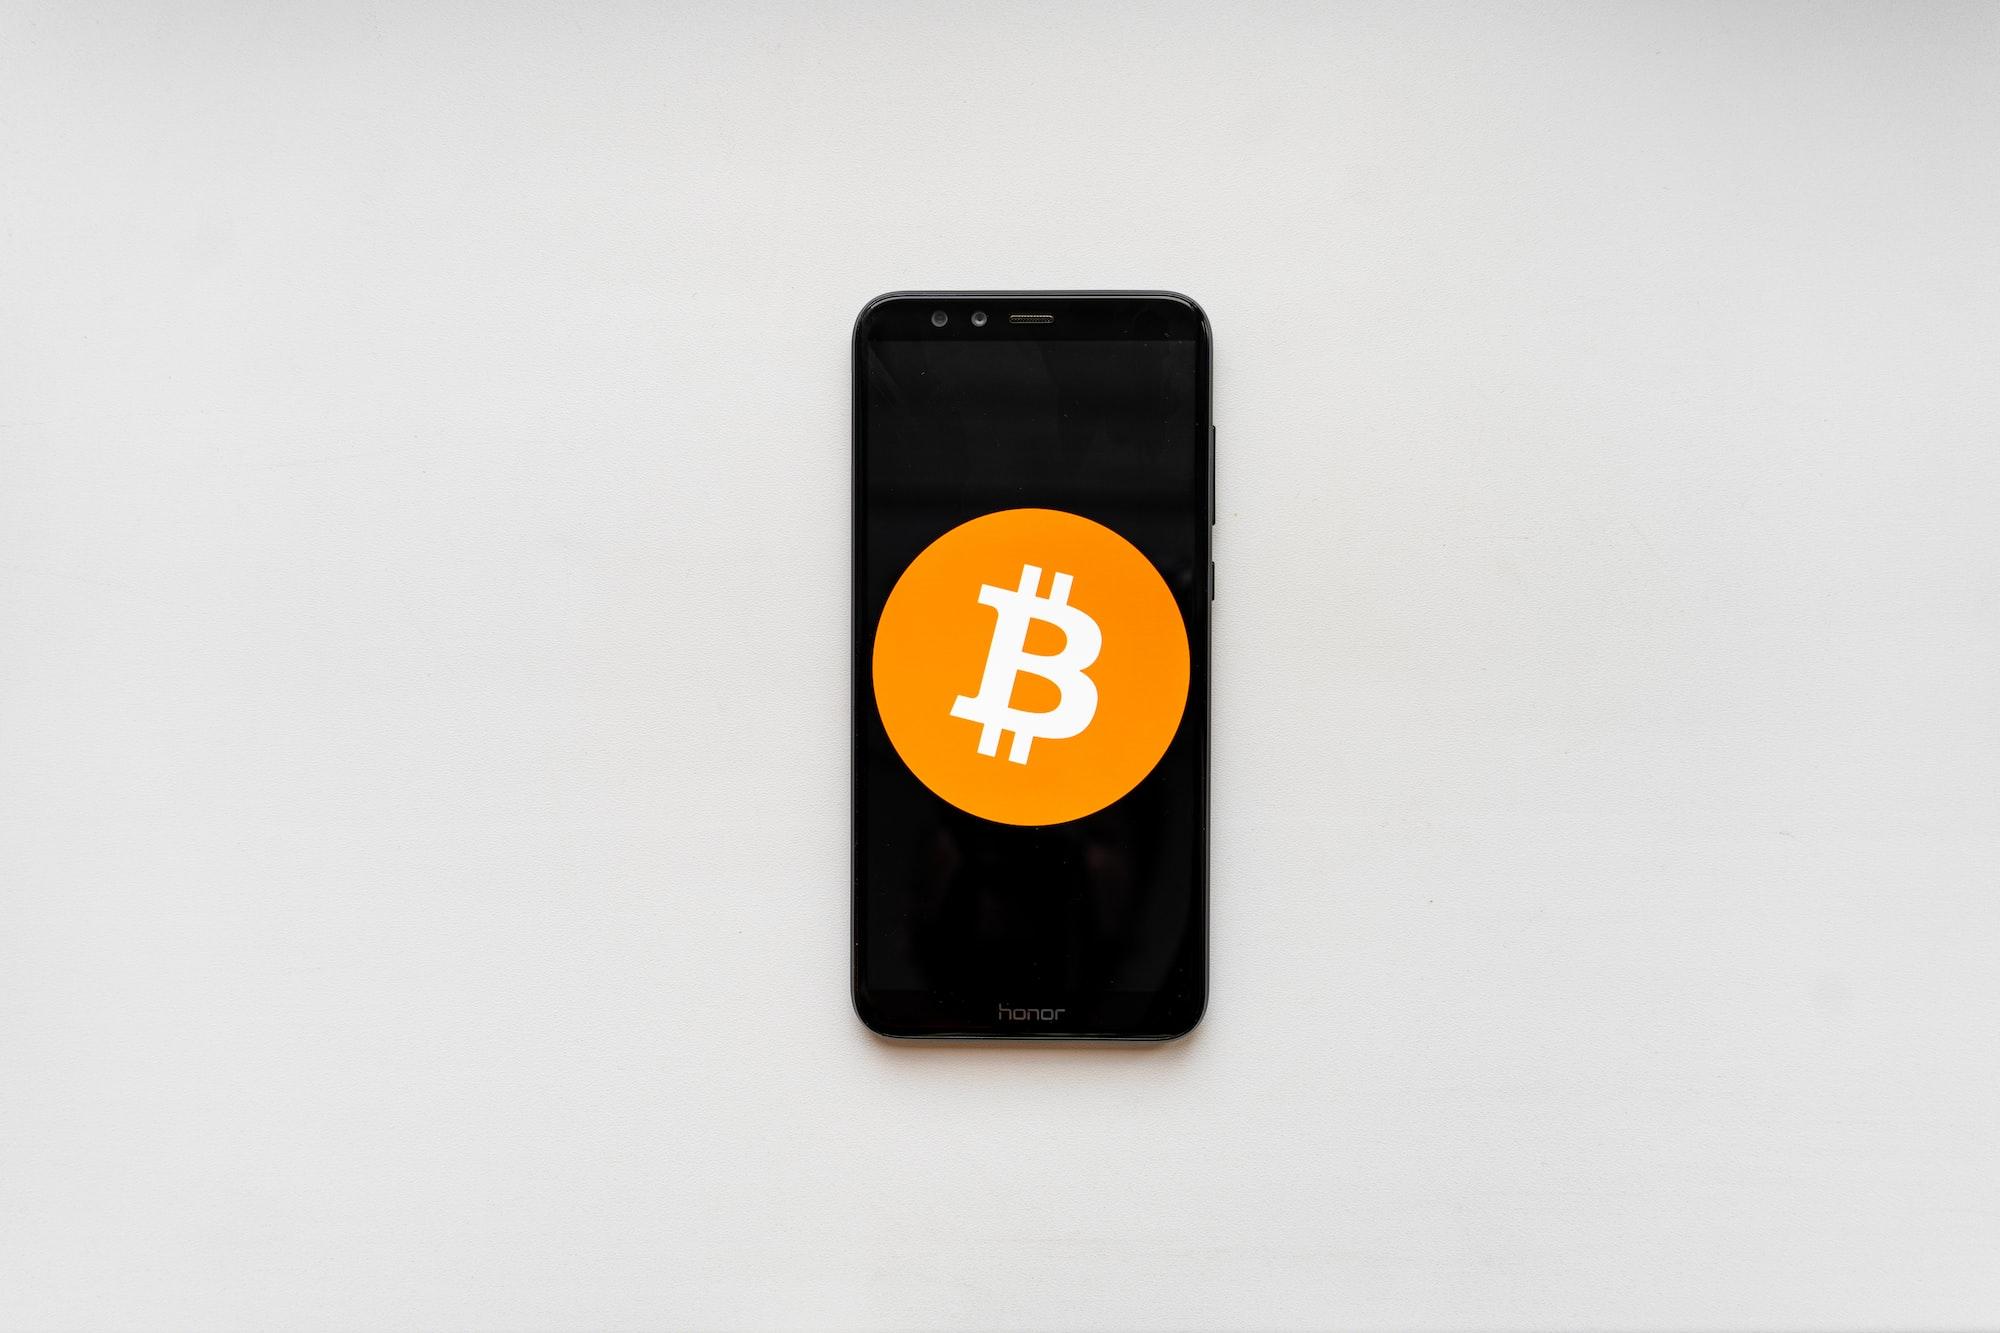 MicroStrategy ออกโบนัสสำหรับคณะกรรมการบริหารด้วย Bitcoin